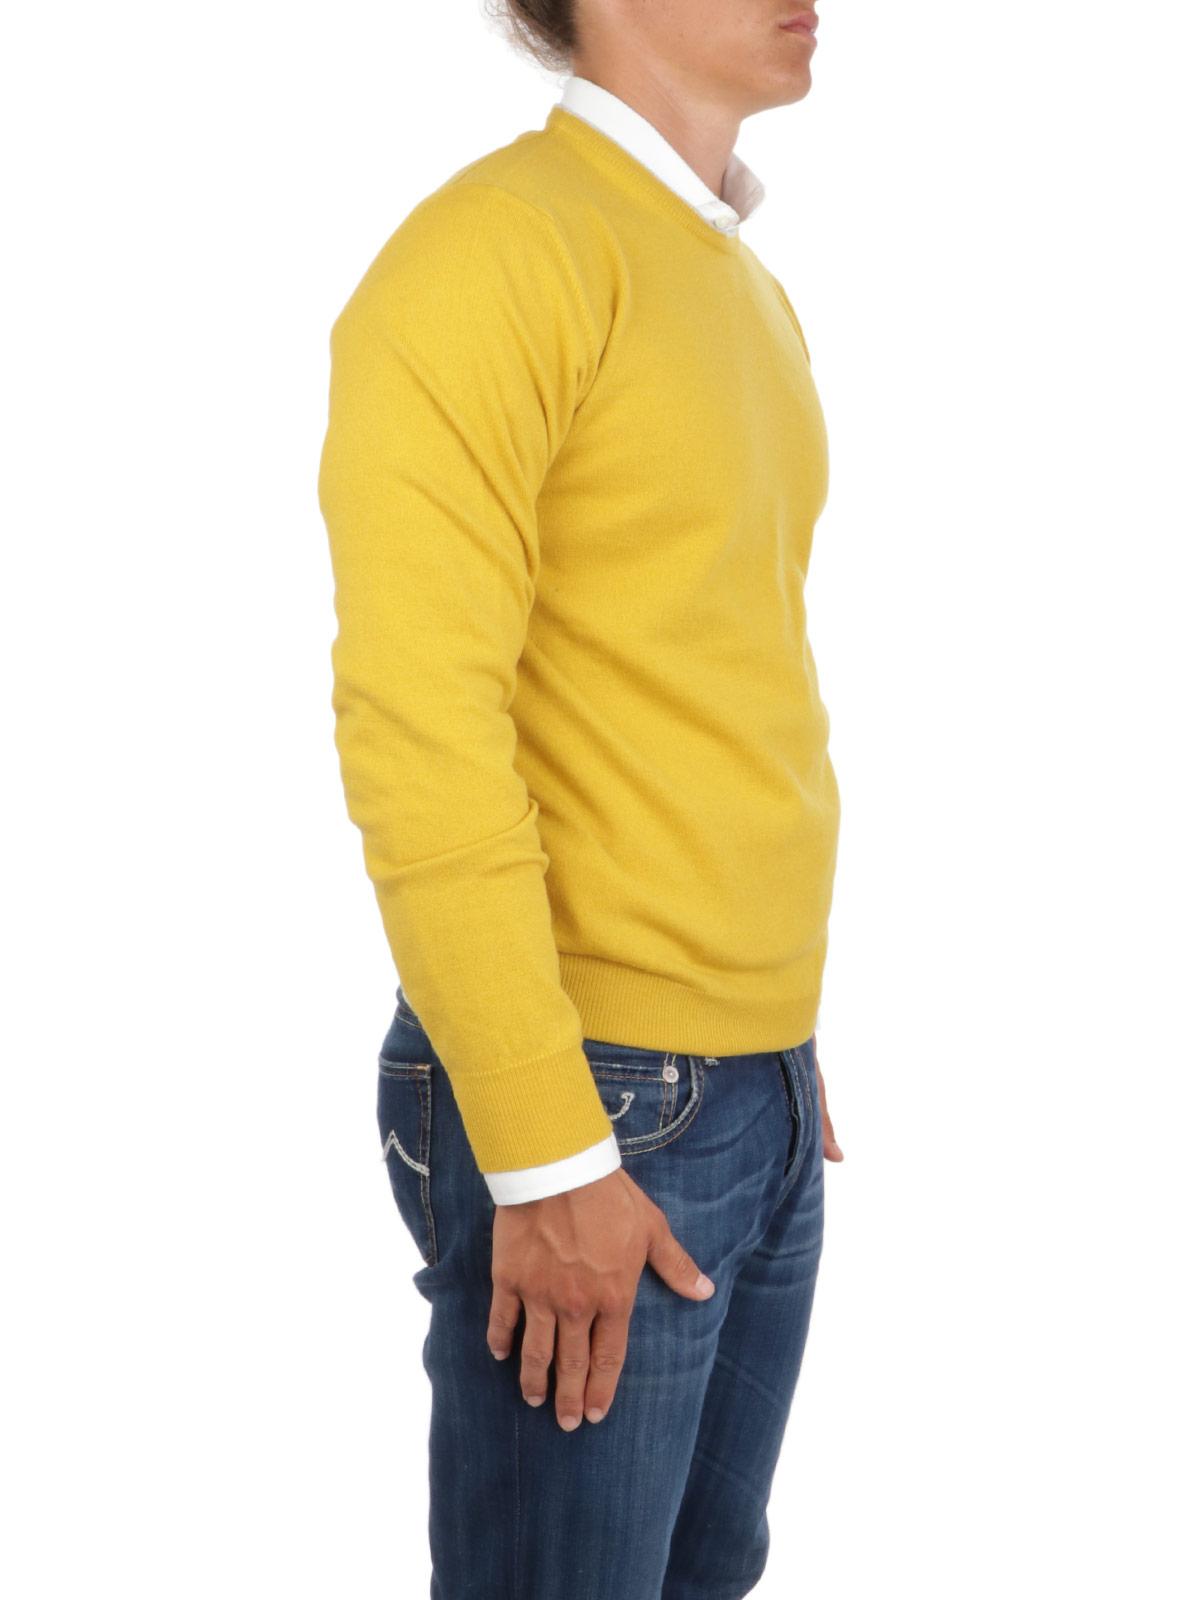 Immagine di BROOKSFIELD   Pullover Uomo in Lana Supergeelong